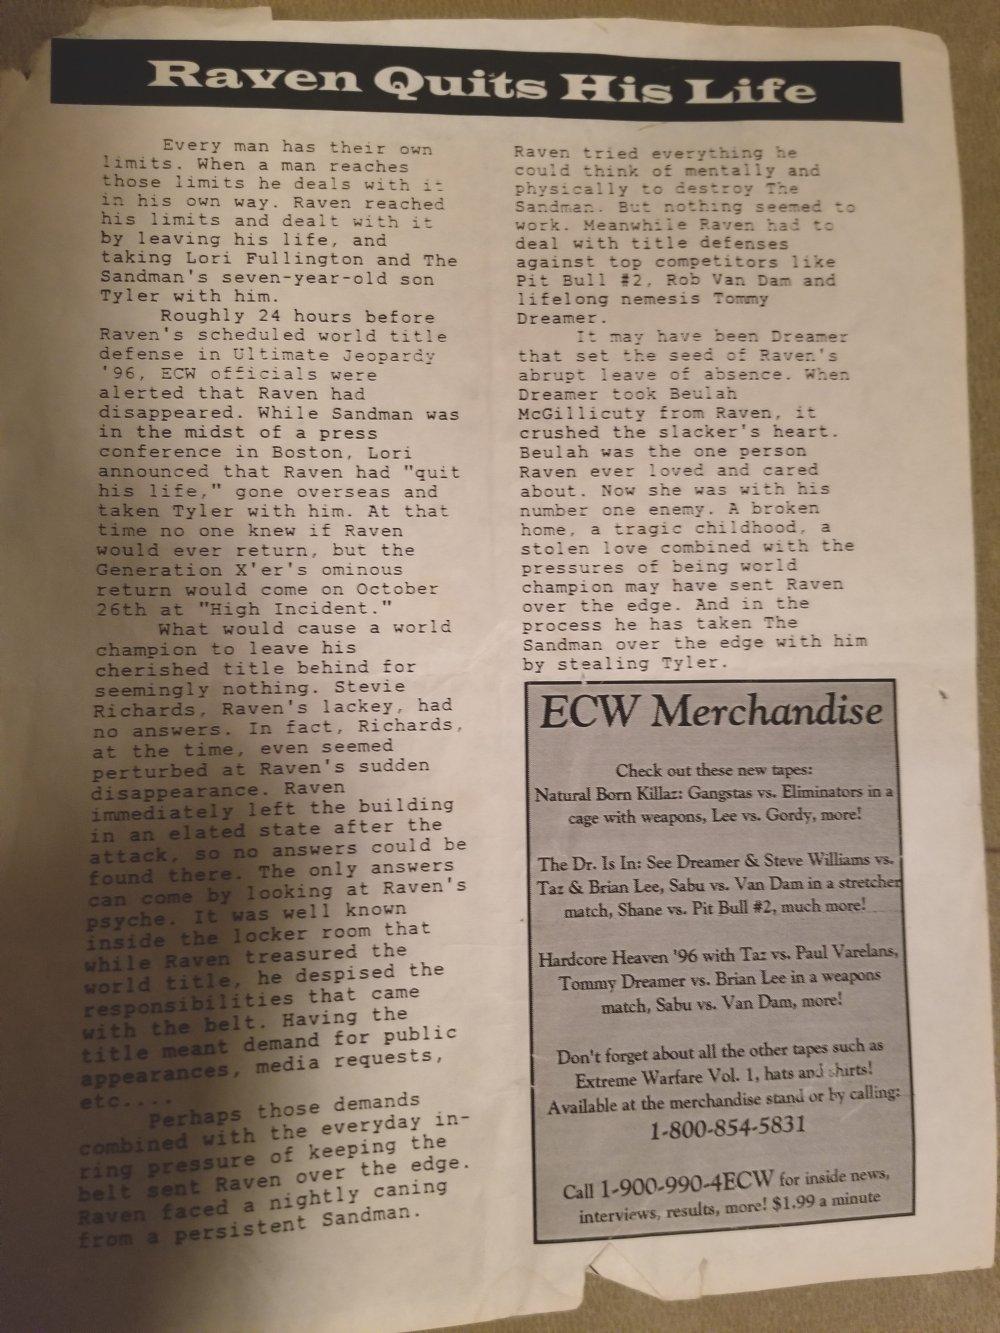 November 2, 1996 back